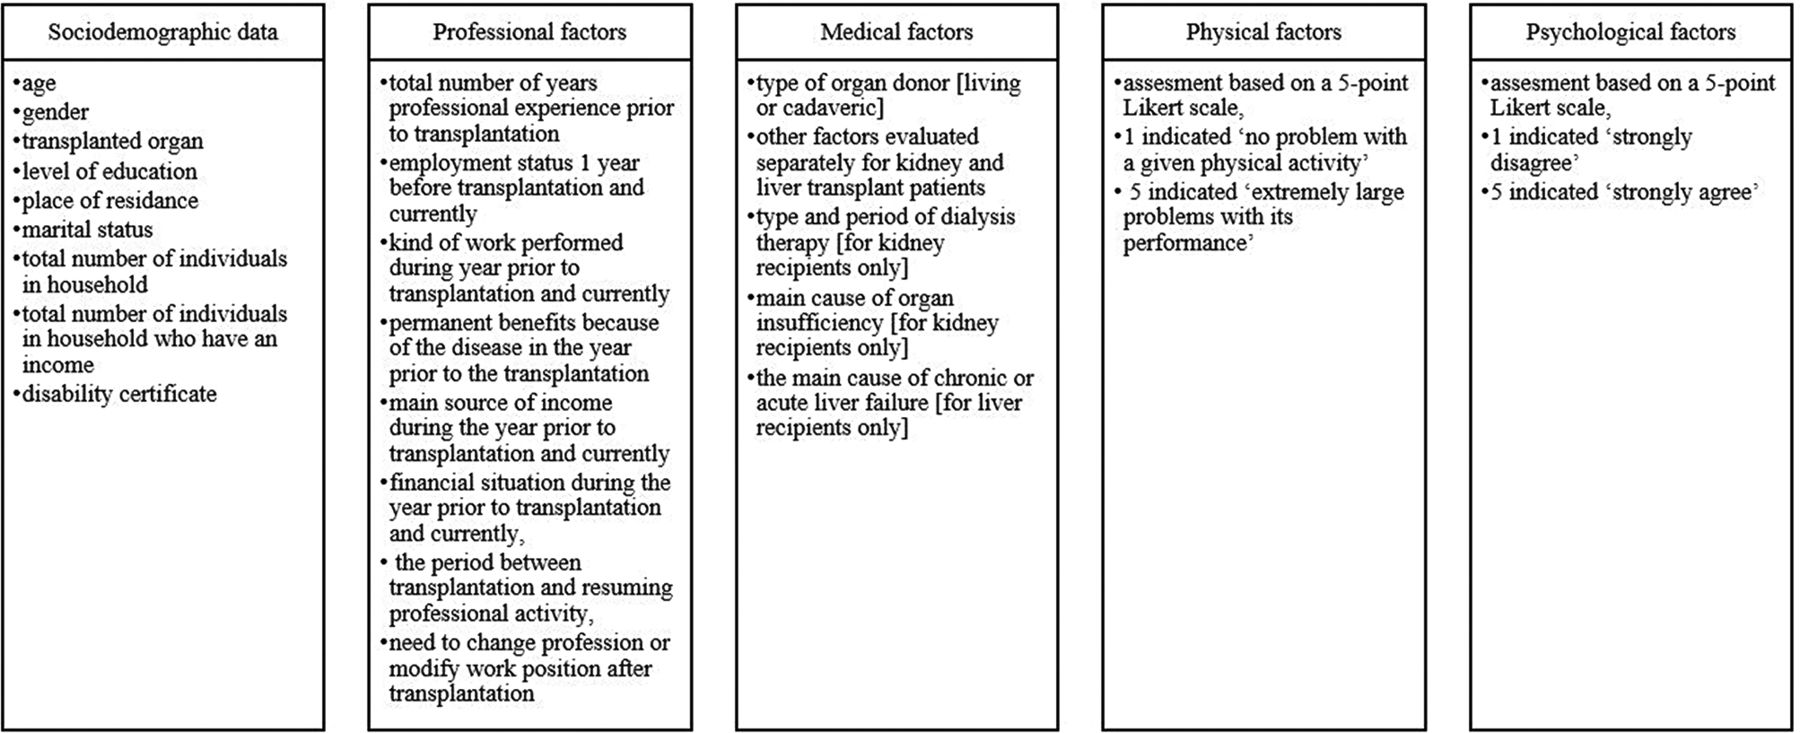 Multivariate analysis of biopsychosocial determinants of